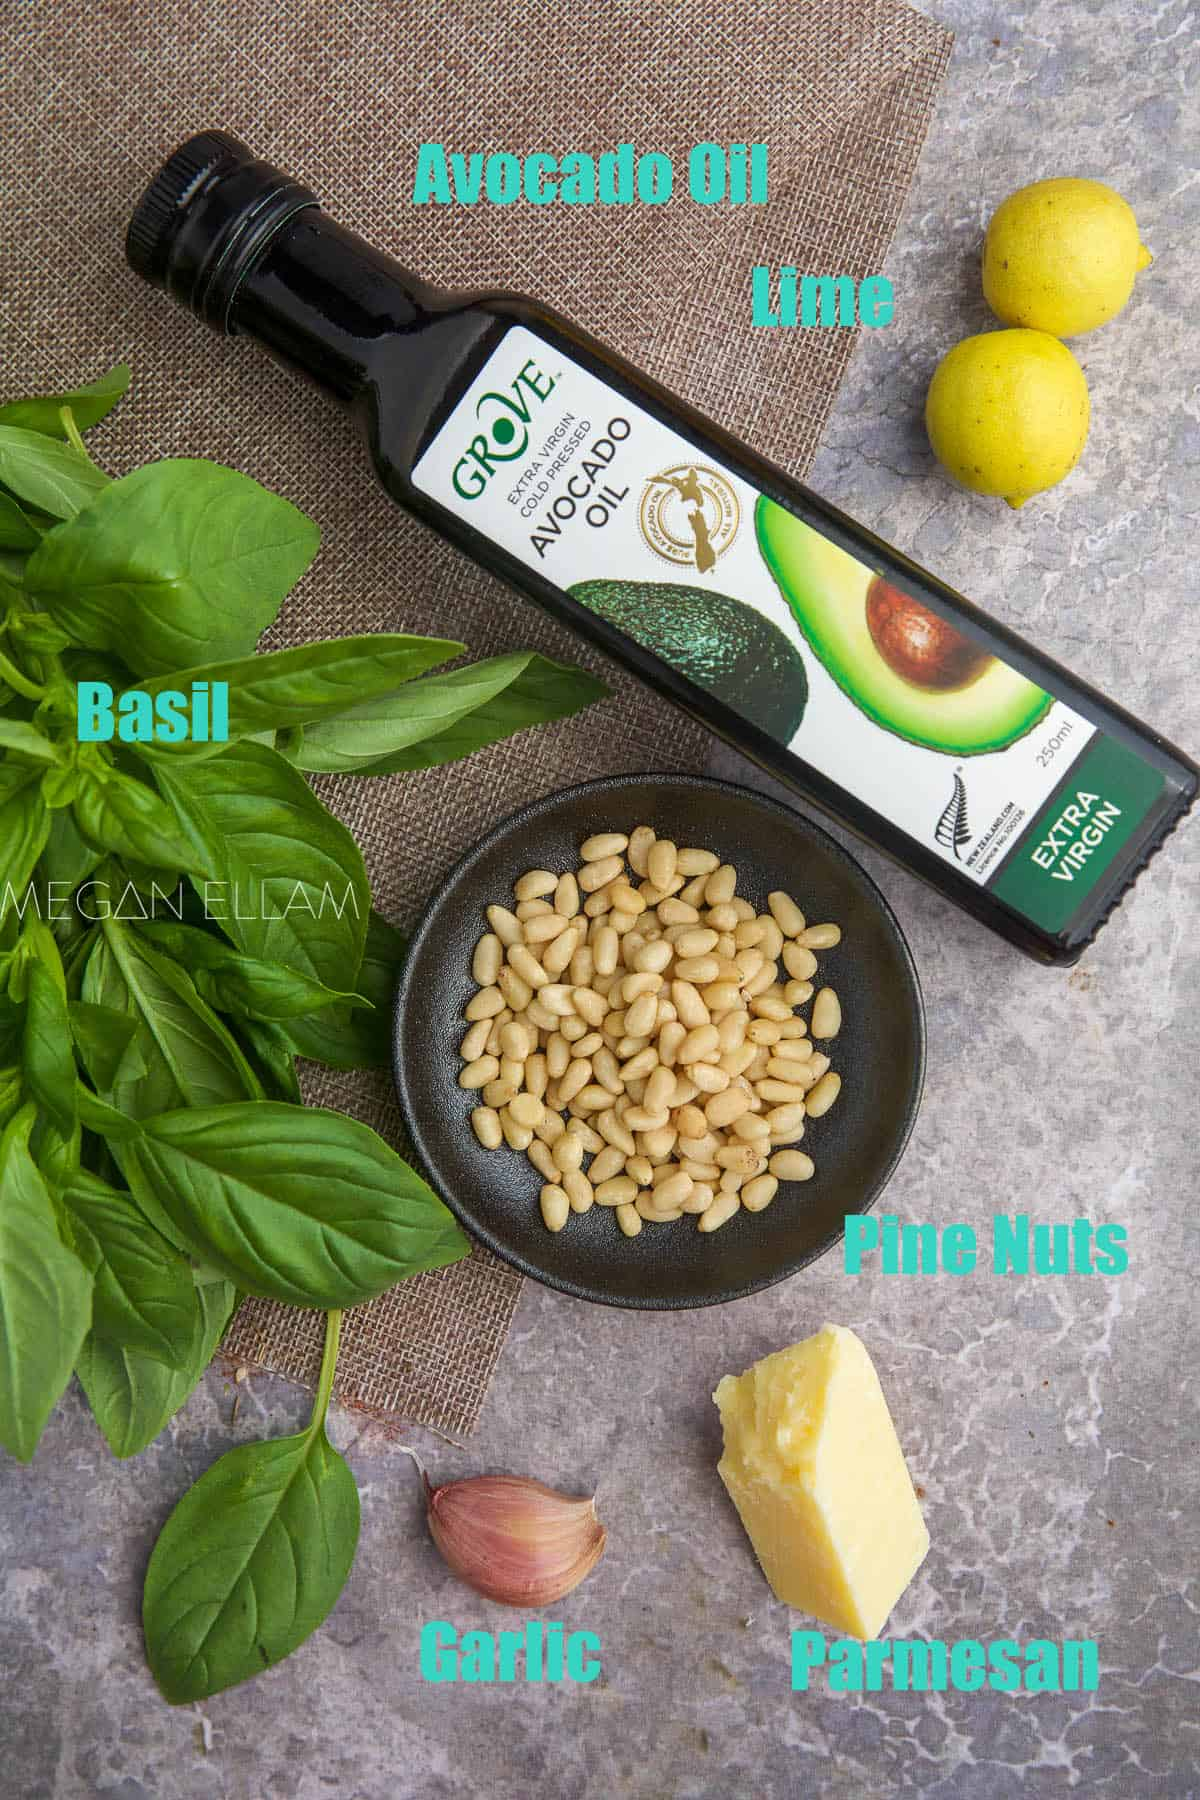 pesto ingredients on a wood backdrop.